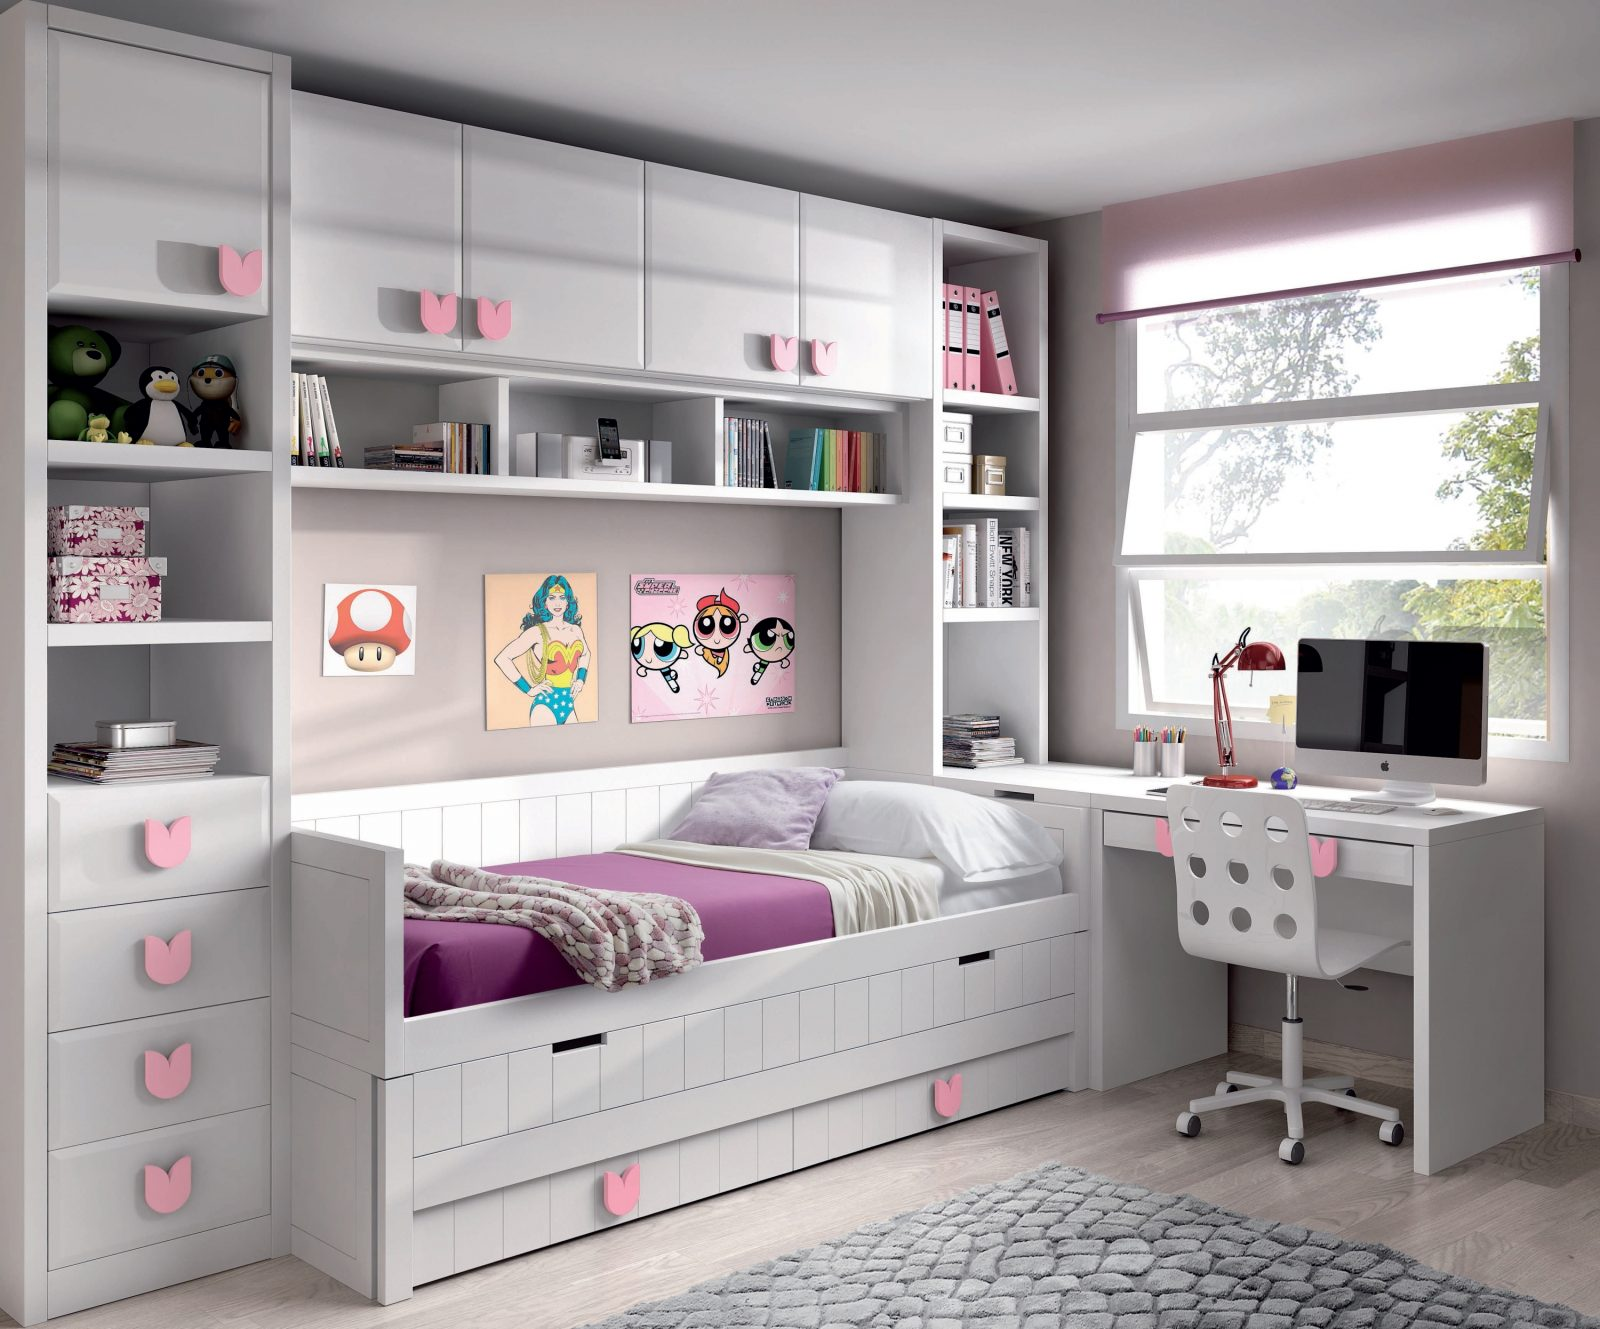 Decoracion mueble sofa habitacion juvenil diseno mueble - Mueble juvenil diseno ...